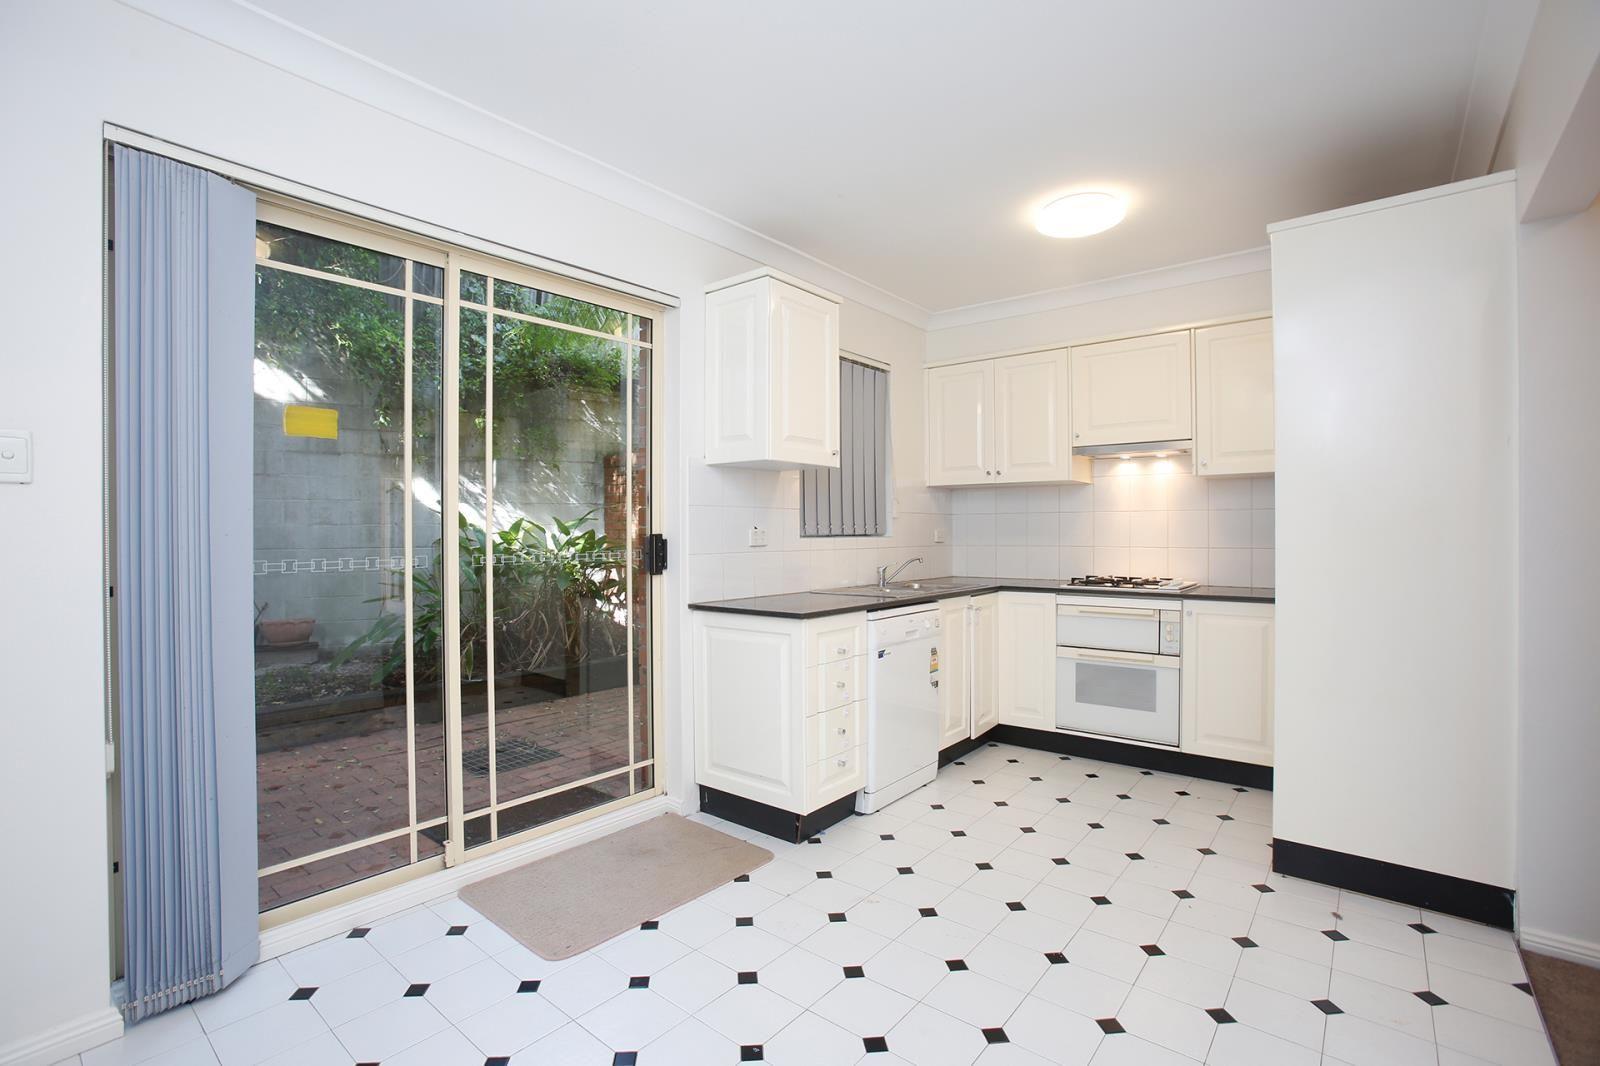 3/5-7 Lithgow Street, Wollstonecraft NSW 2065, Image 1